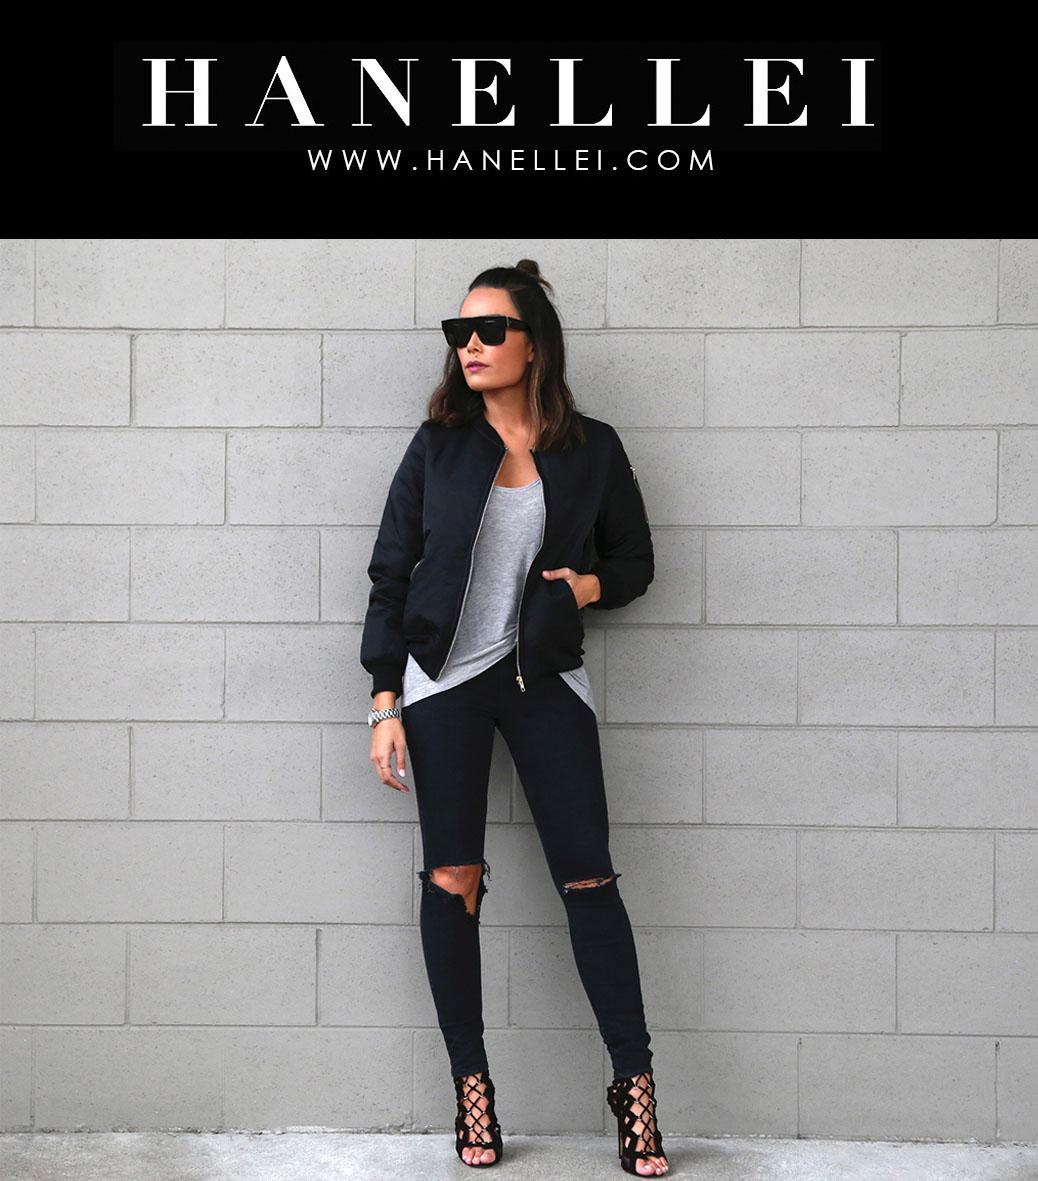 Hanellei.com